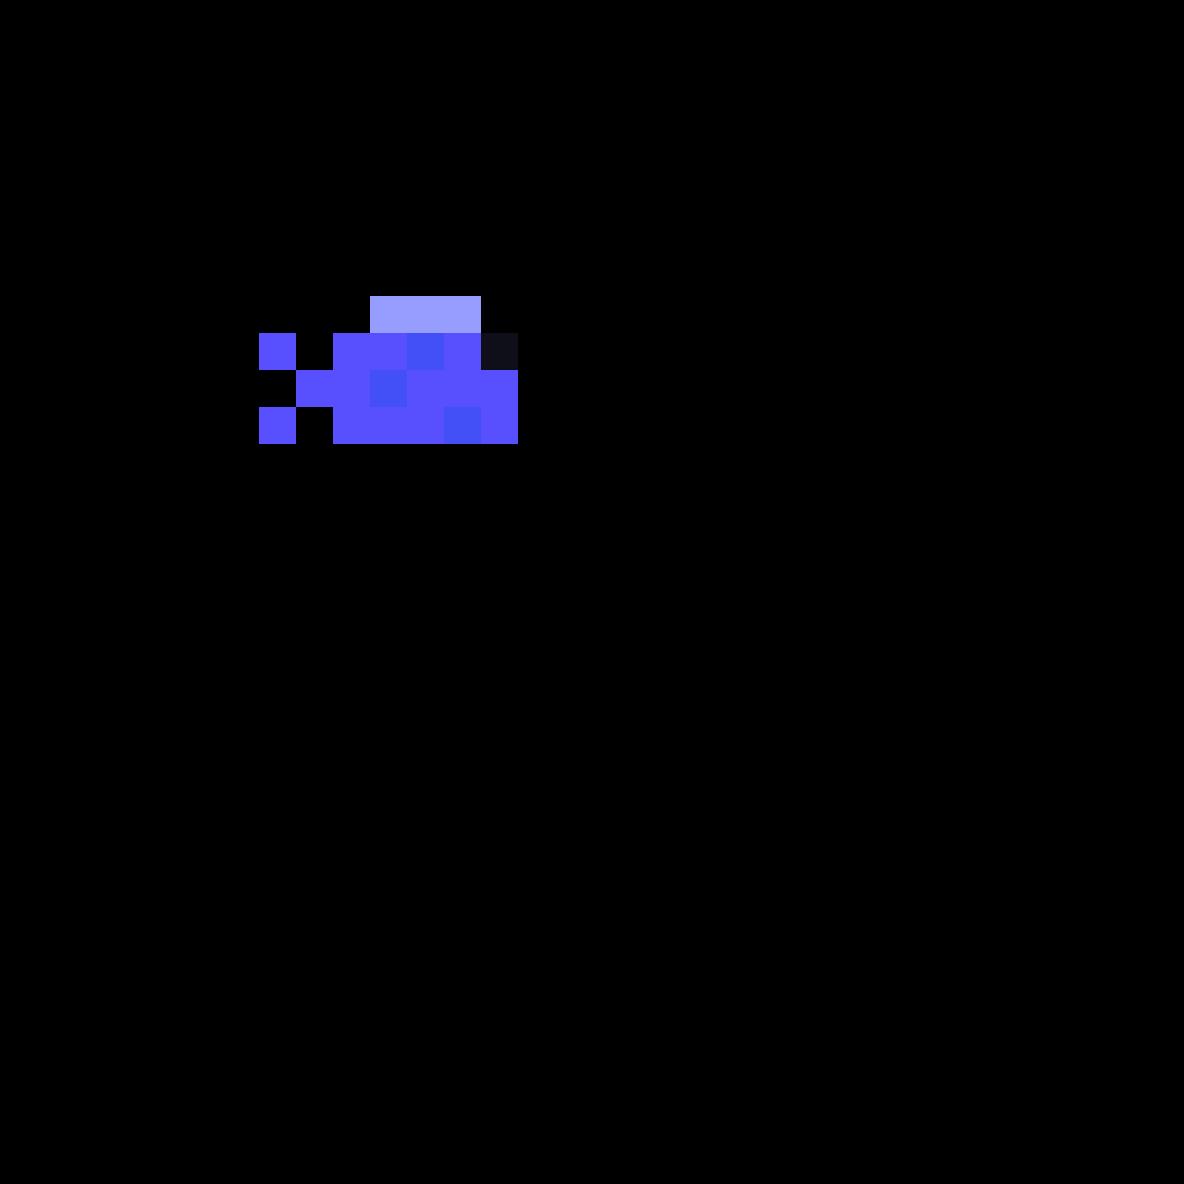 fish by Pixel-Lil